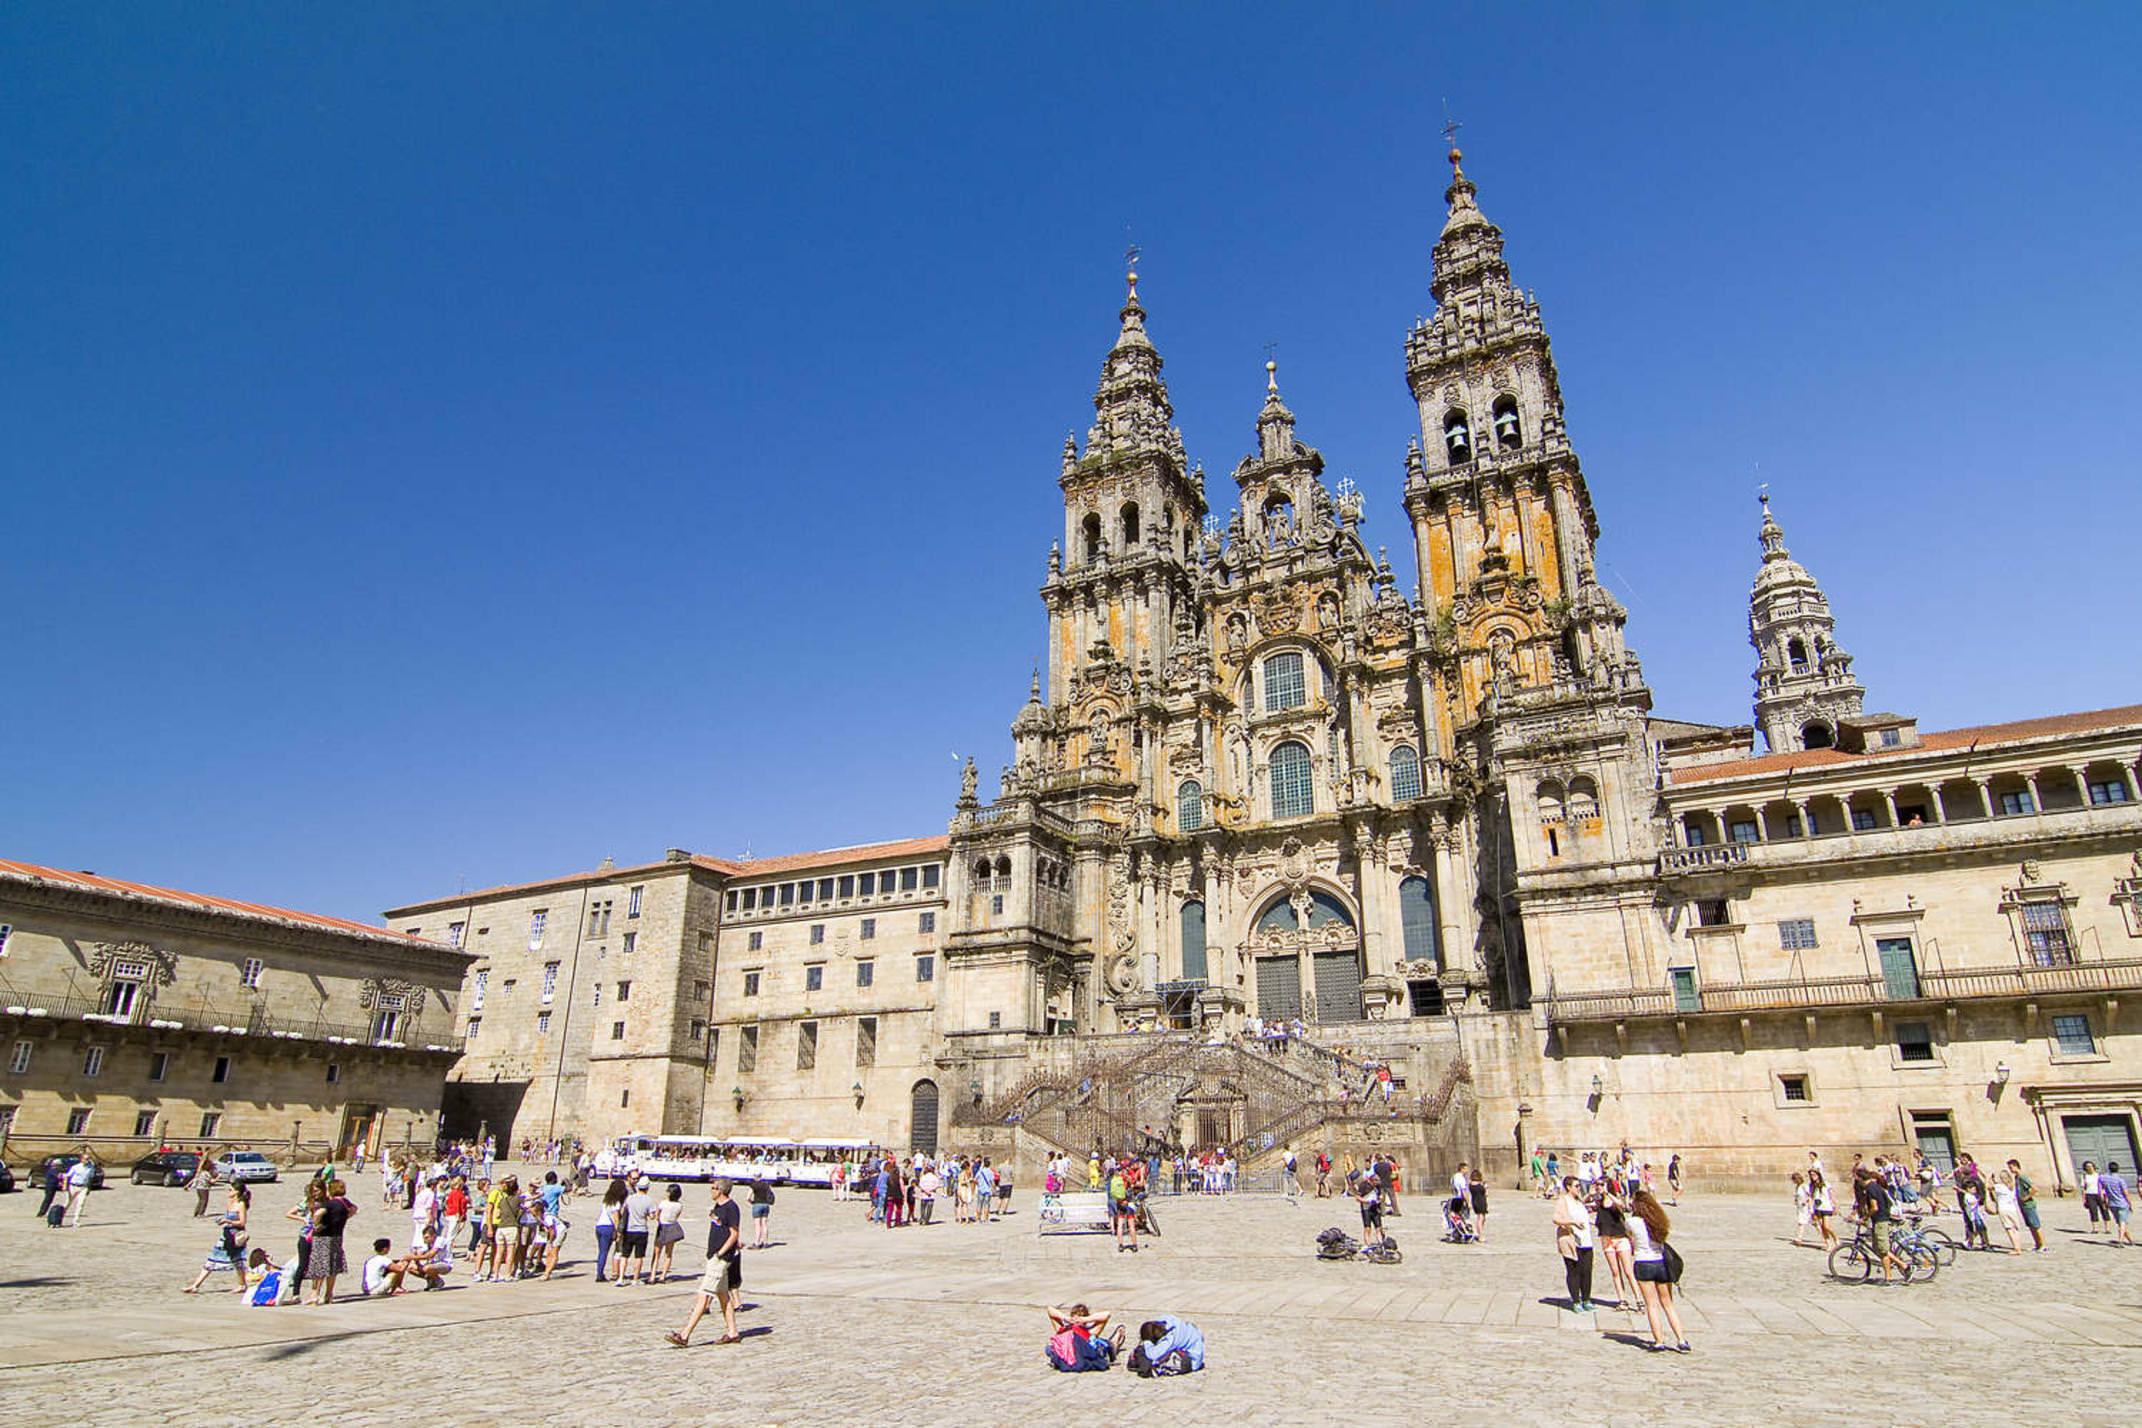 Spain santiago de compostela view of obradoiro square and cathedral of santiago